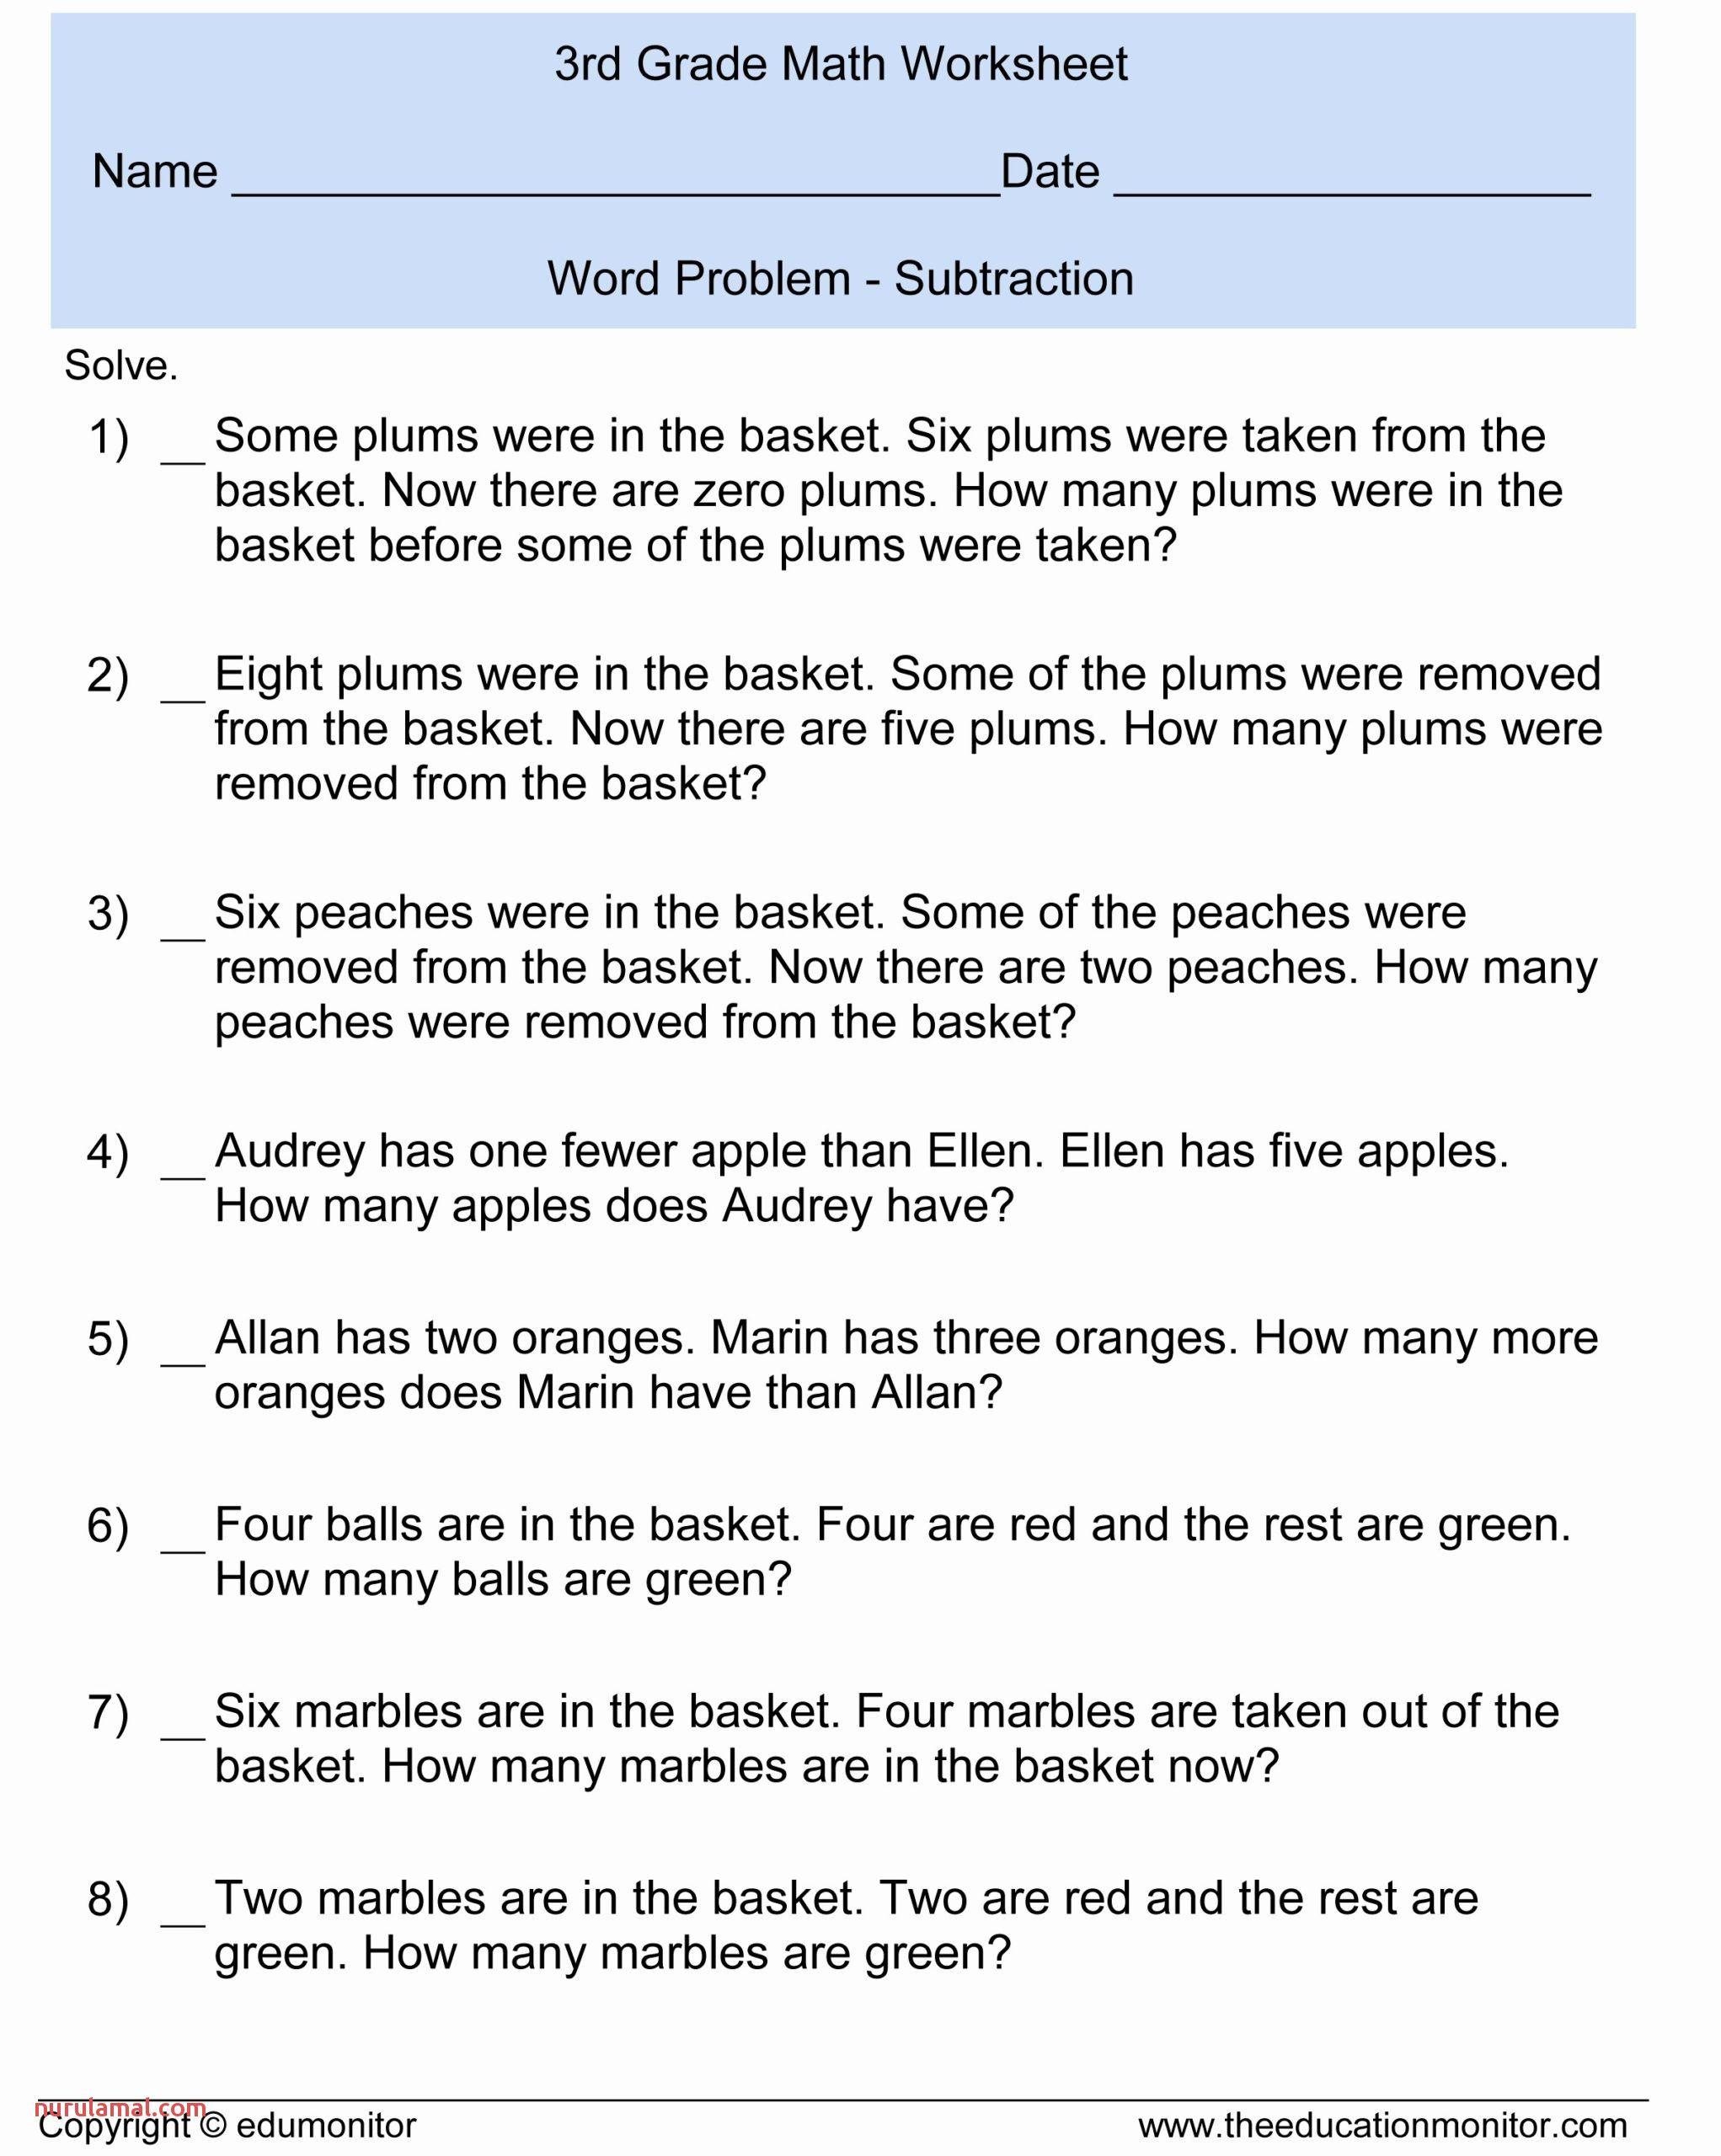 Printable 2nd Grade Math Worksheets Free Word Problem Worksheets 4th Grade Math Worksheets 3rd Grade Math Worksheets